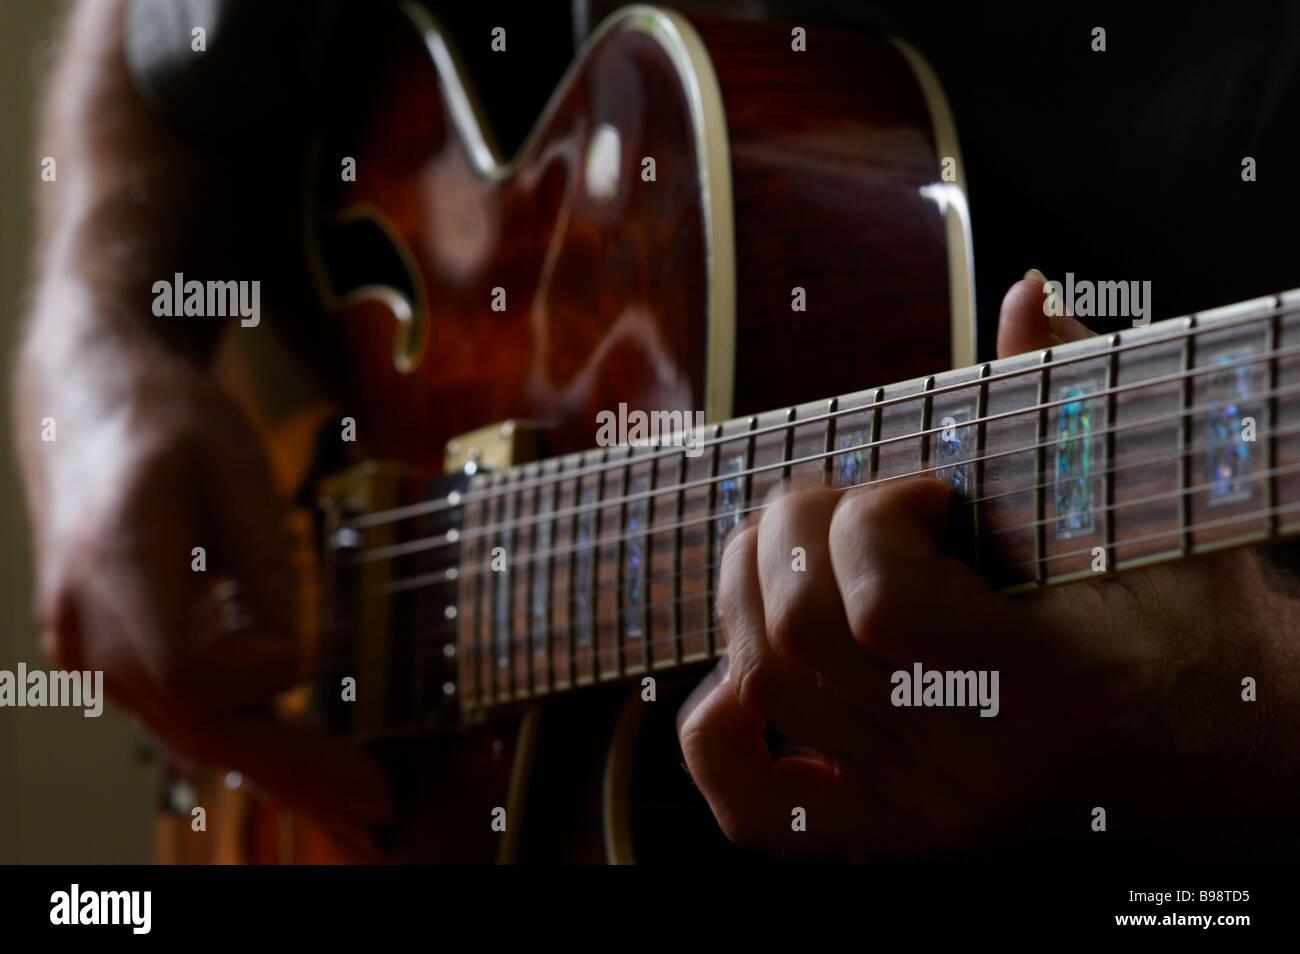 Guy playing electric jazz guitar - Stock Image